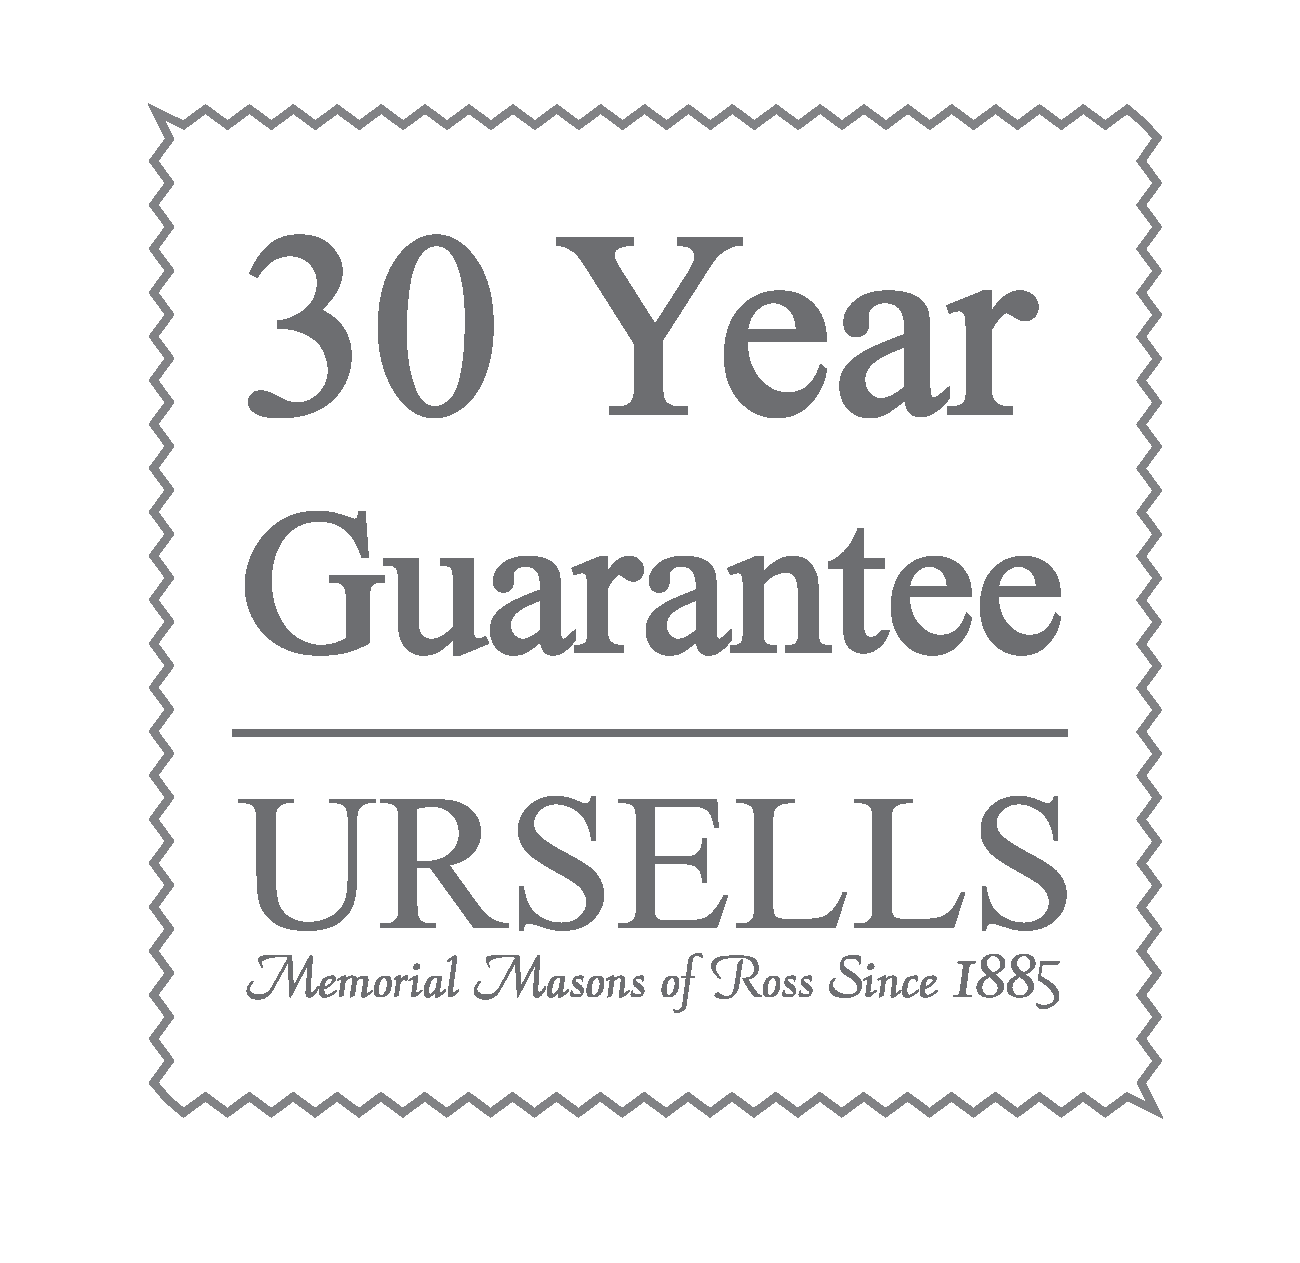 Ursells 30 Year Guarantee Logo